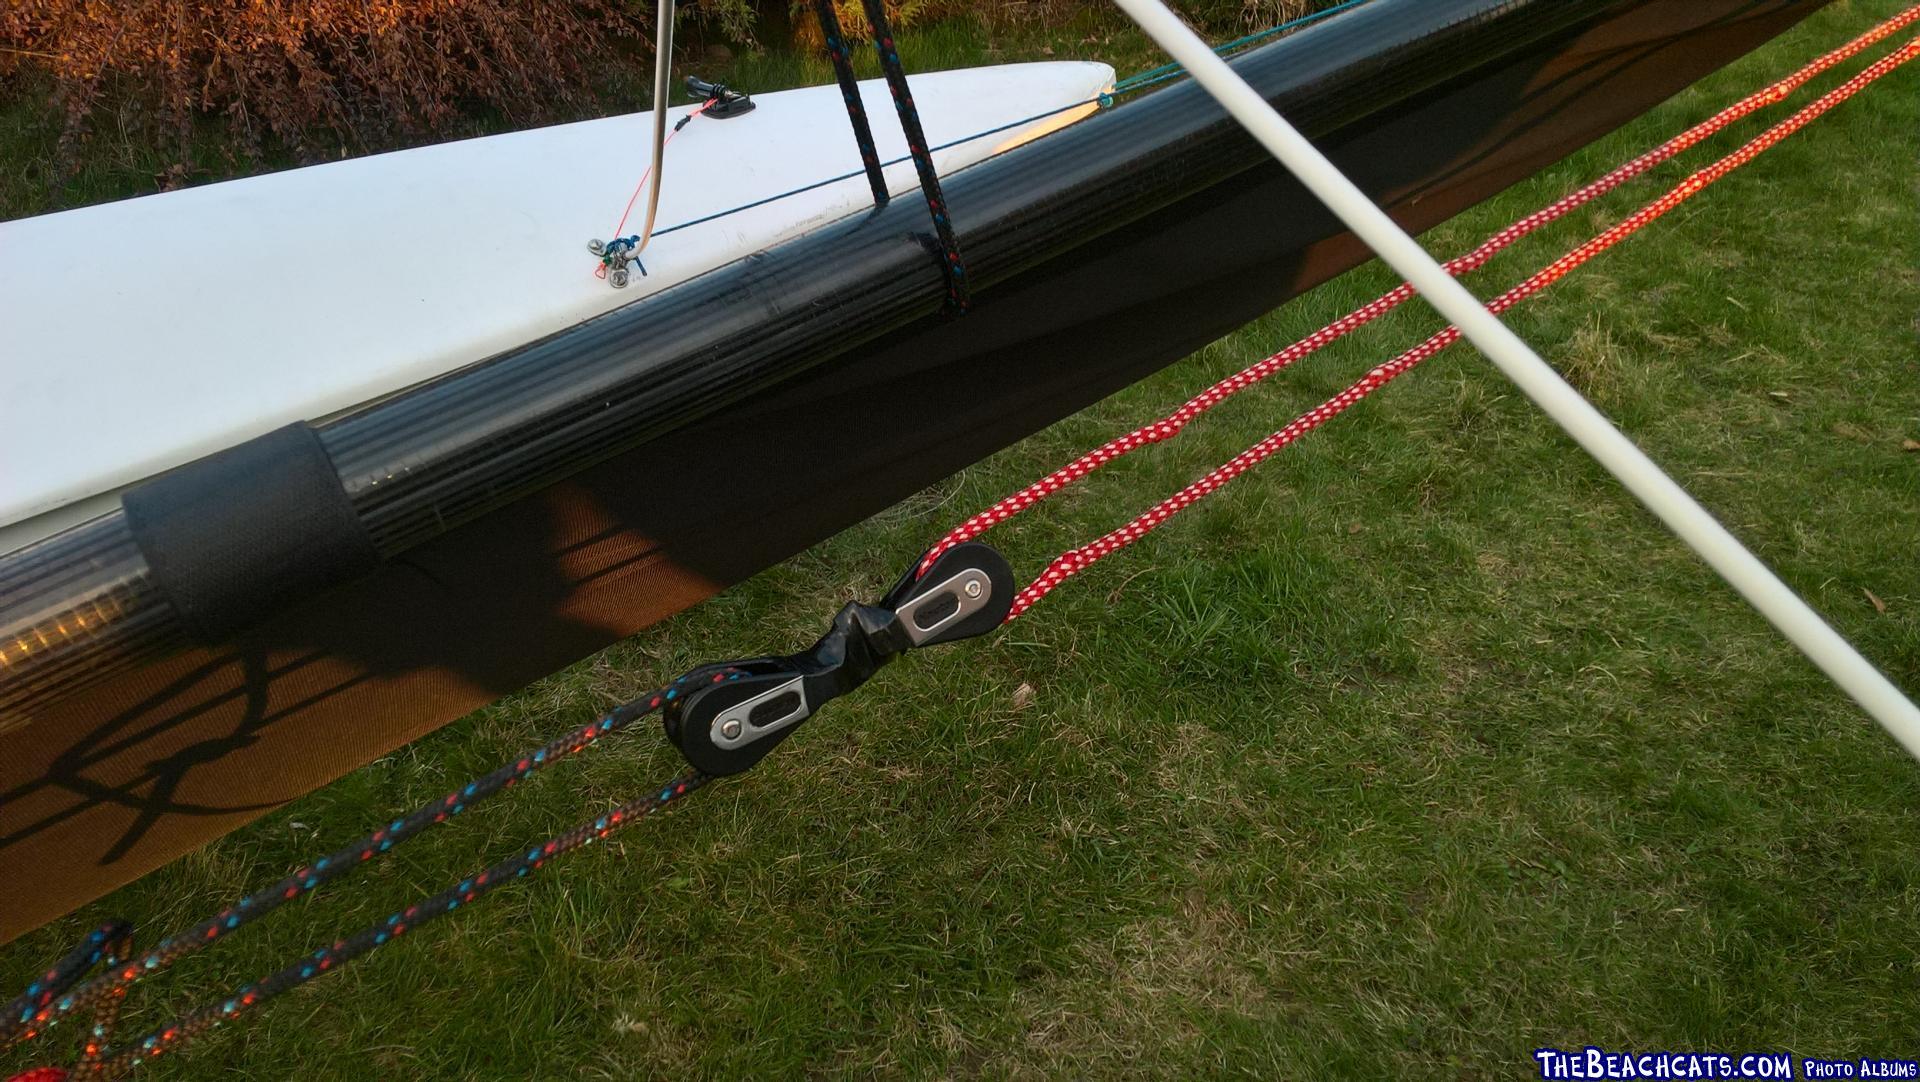 One line system for hoisting